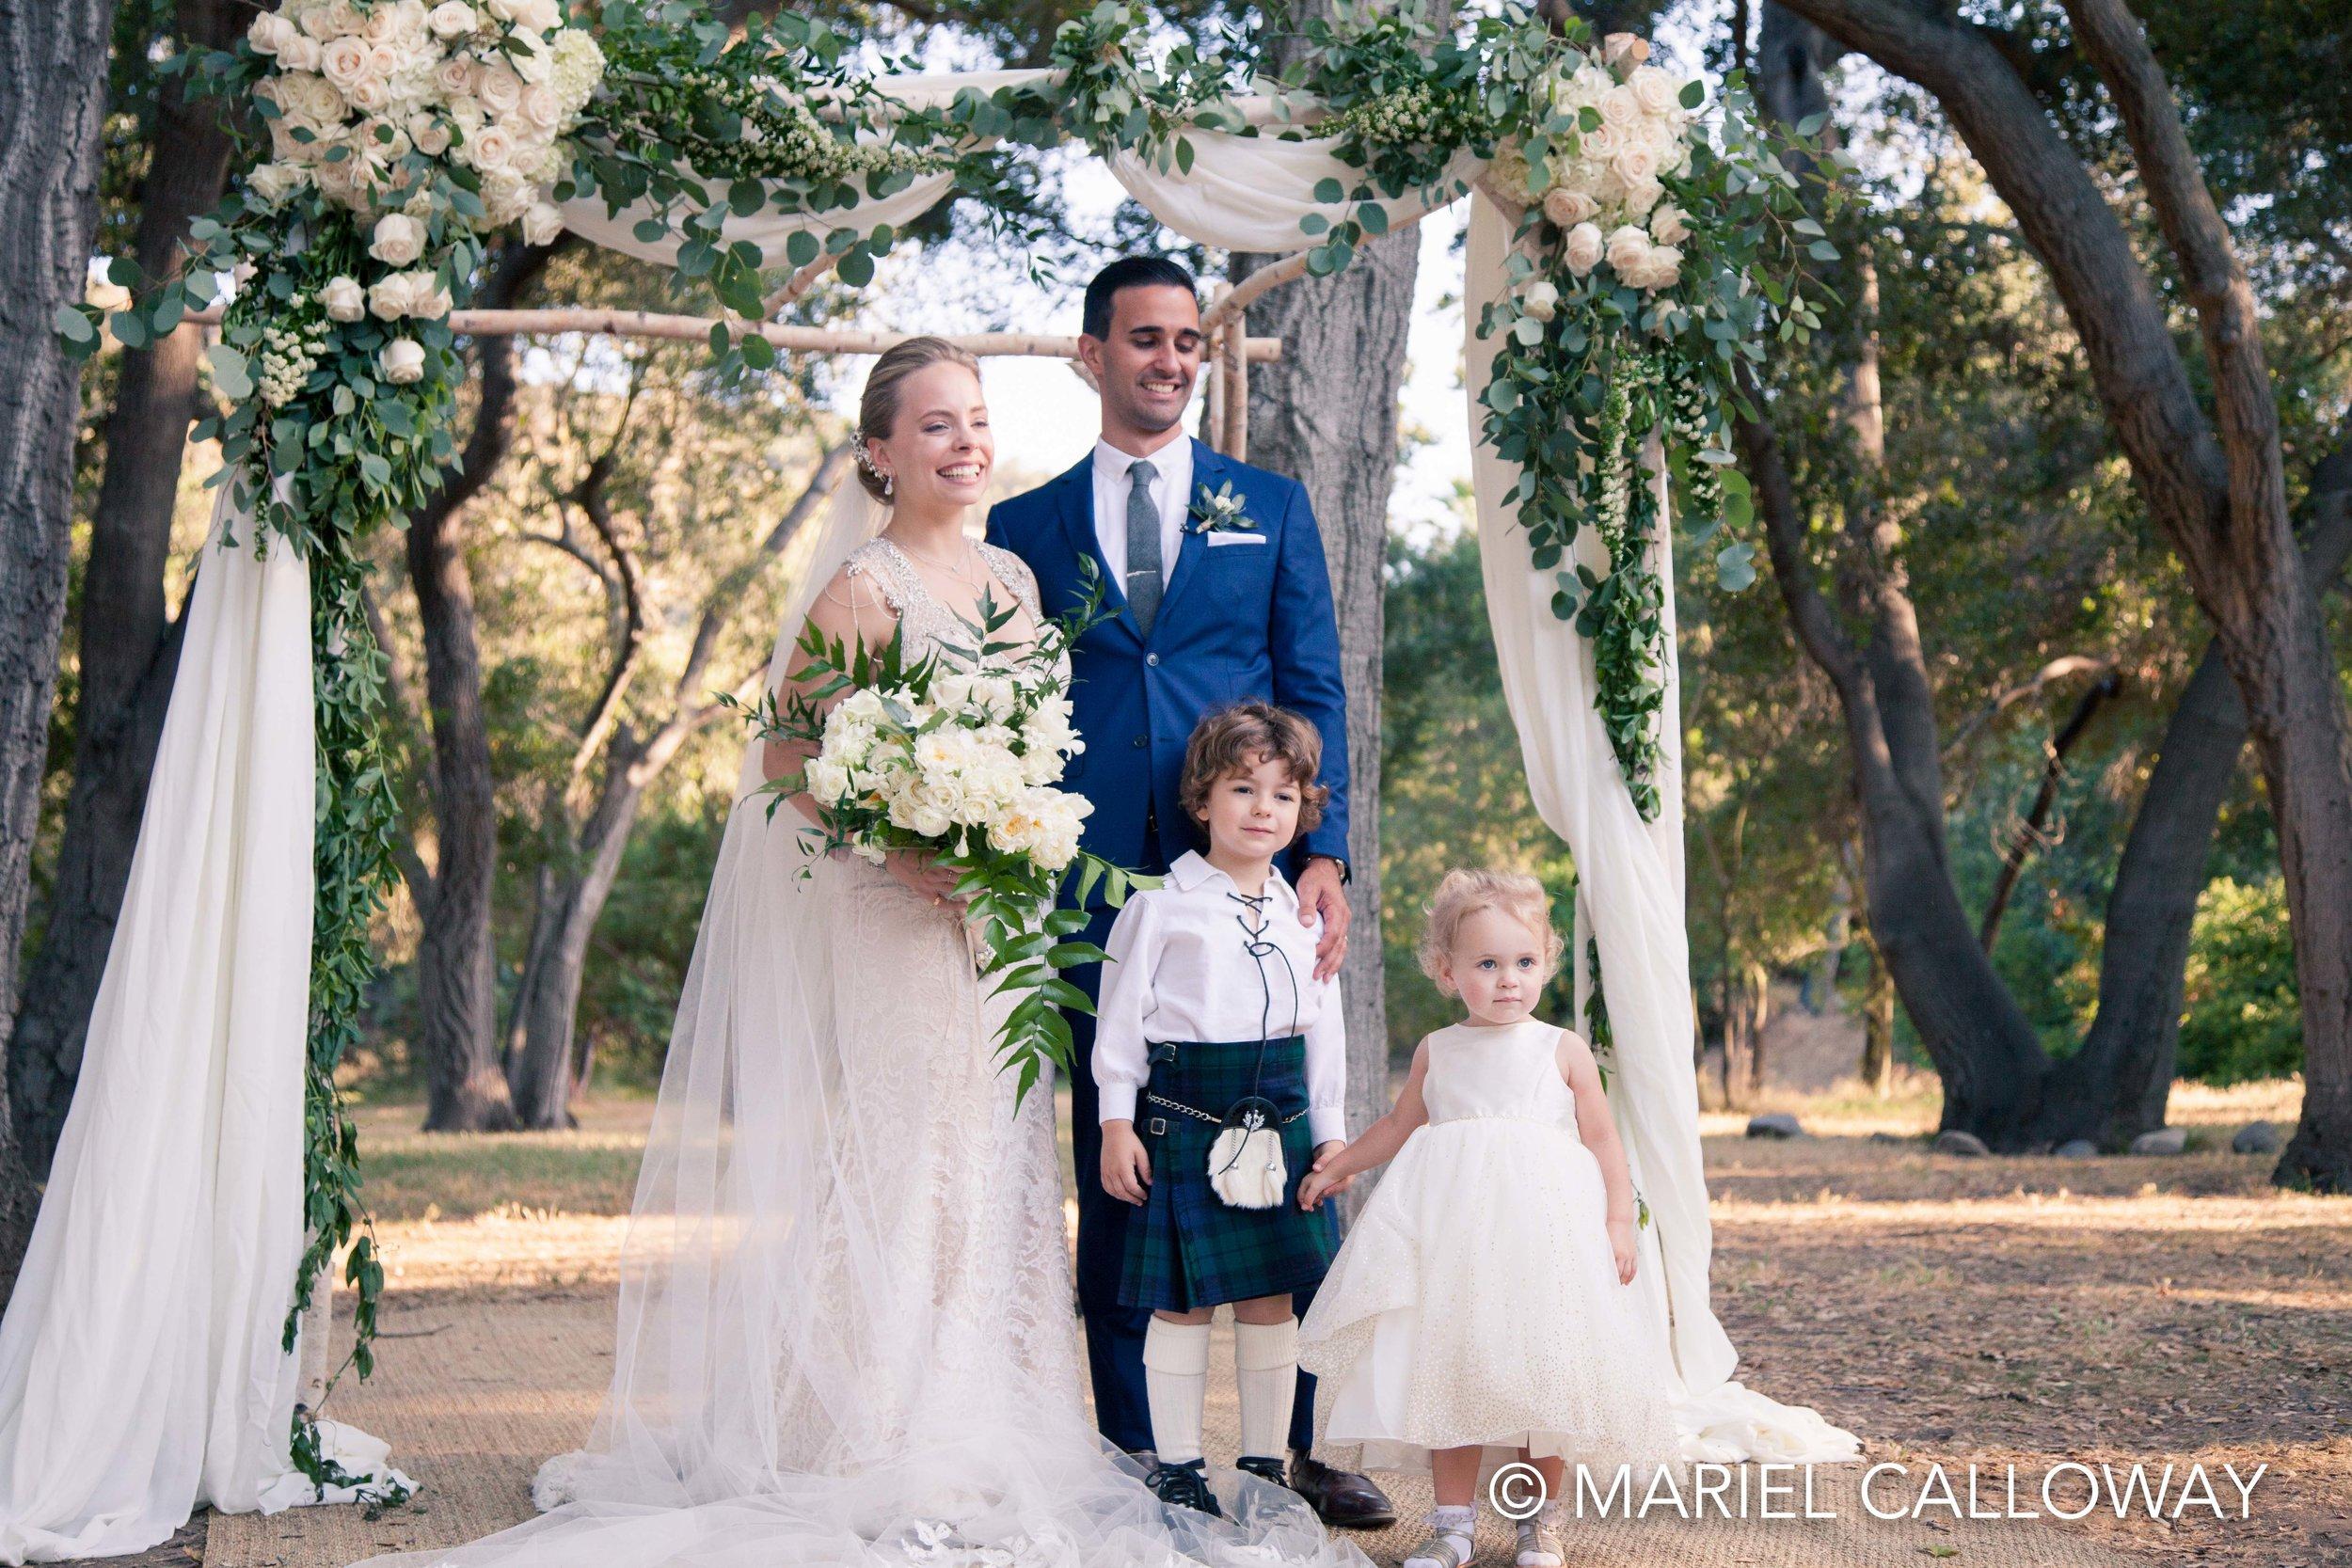 Mariel-Calloway-Los-Angeles-Wedding-Photography-Smith-28.jpg